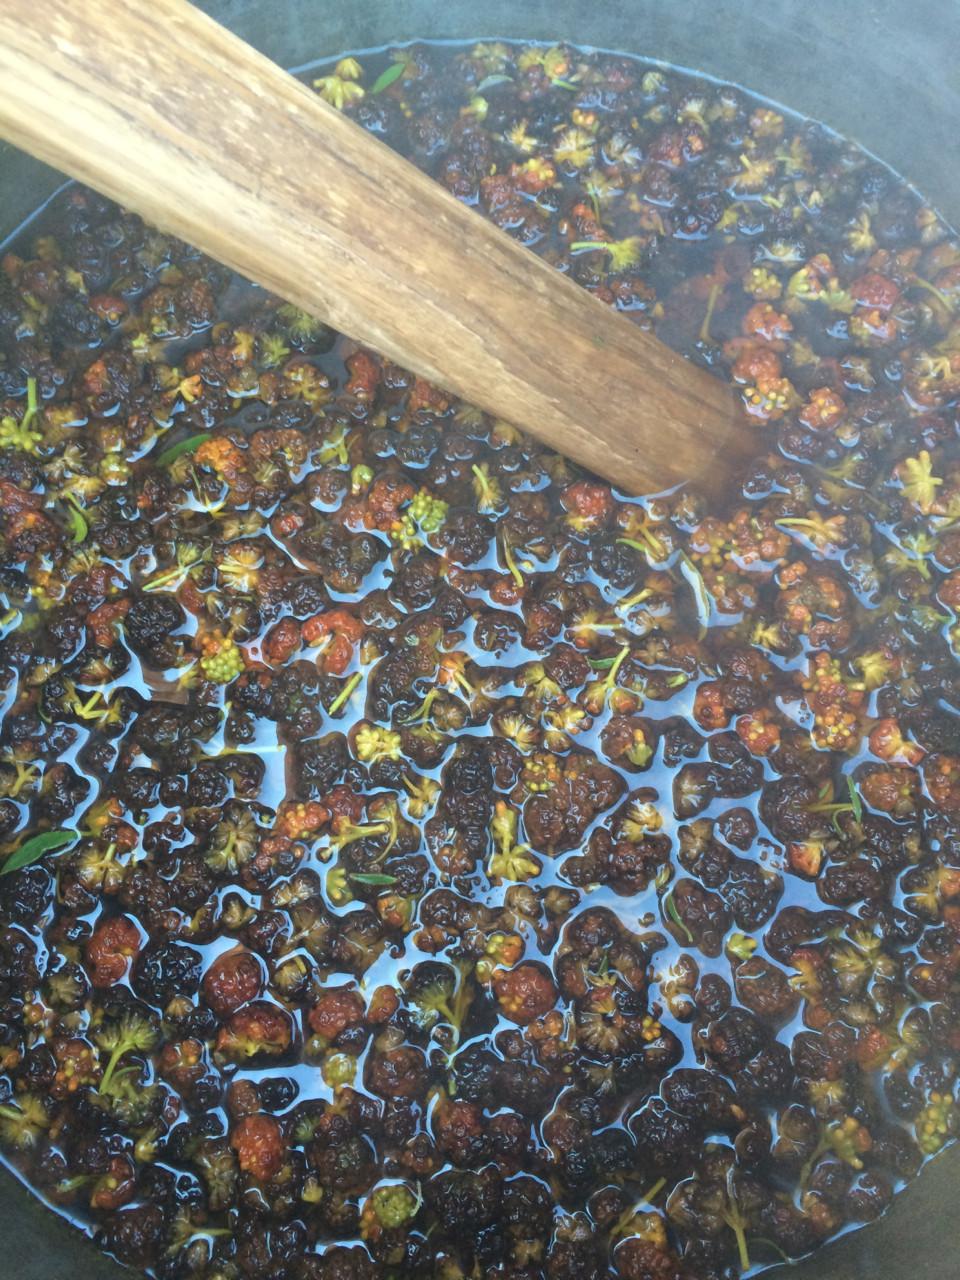 Q'olle flowers boiling to dye yarn a rich mustard tone (image courtesy of Dana Blair)